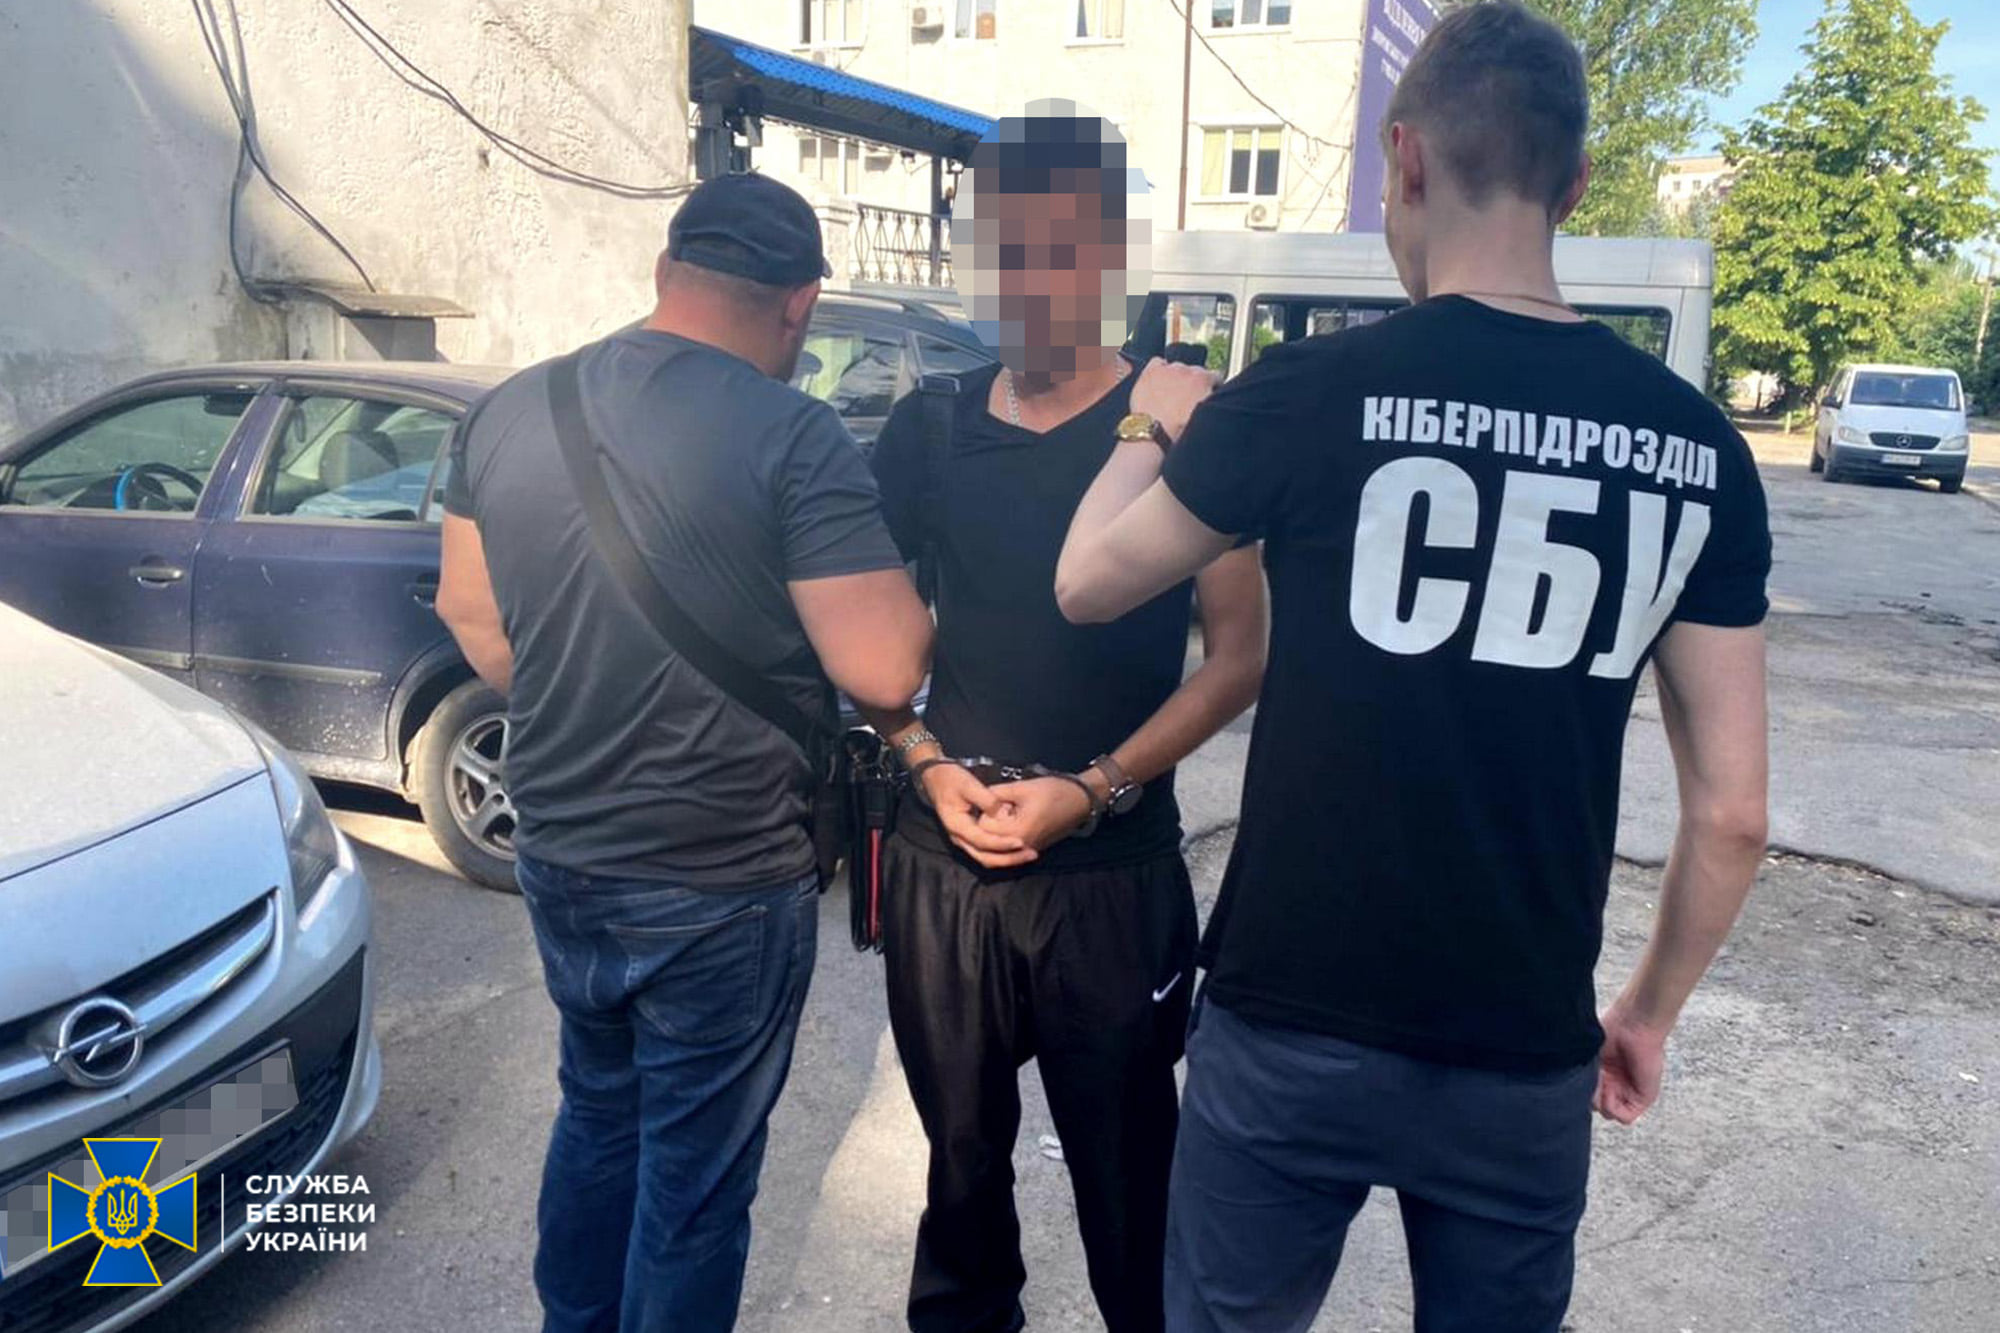 СБУ задержала в Харькове молдаванина-мошенника (фото)